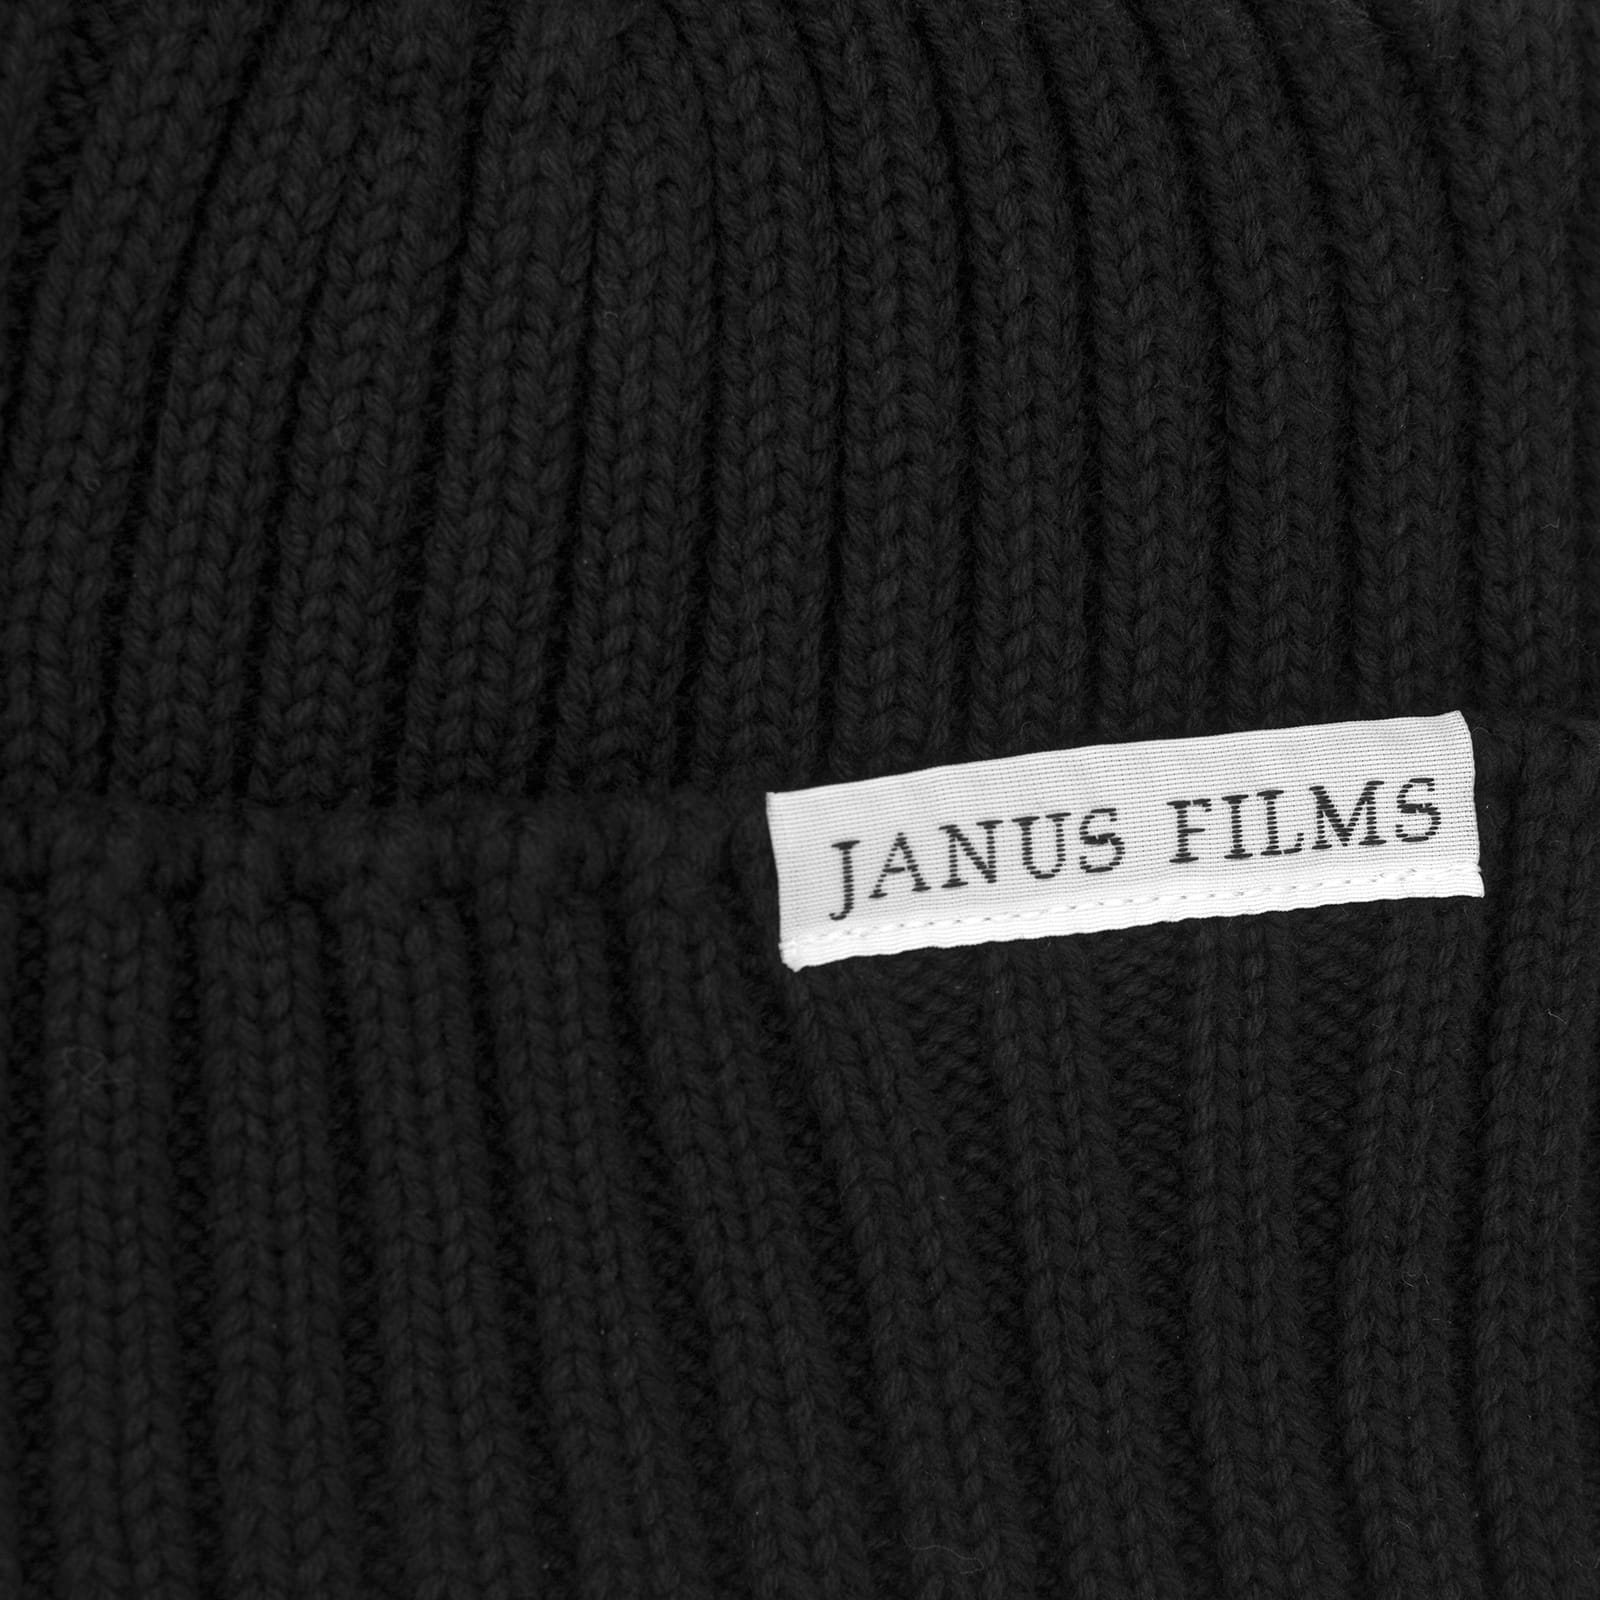 Janus Films Knit Cap